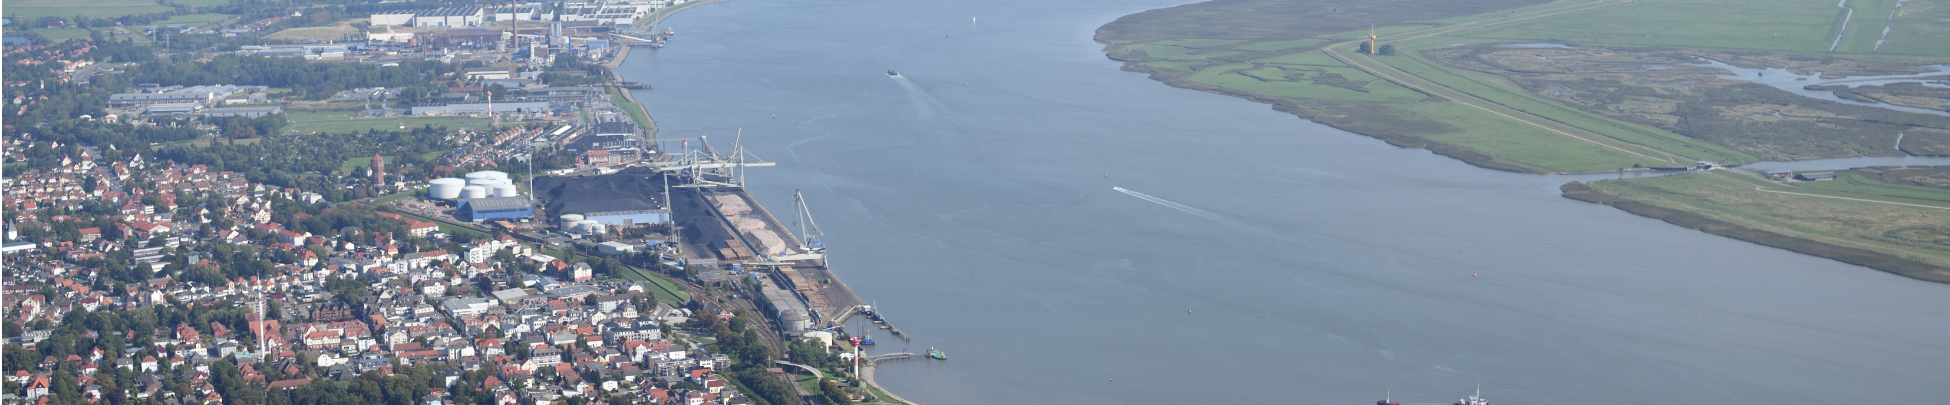 https://www.seaports.de/content/uploads/Nordenham_banner.jpg